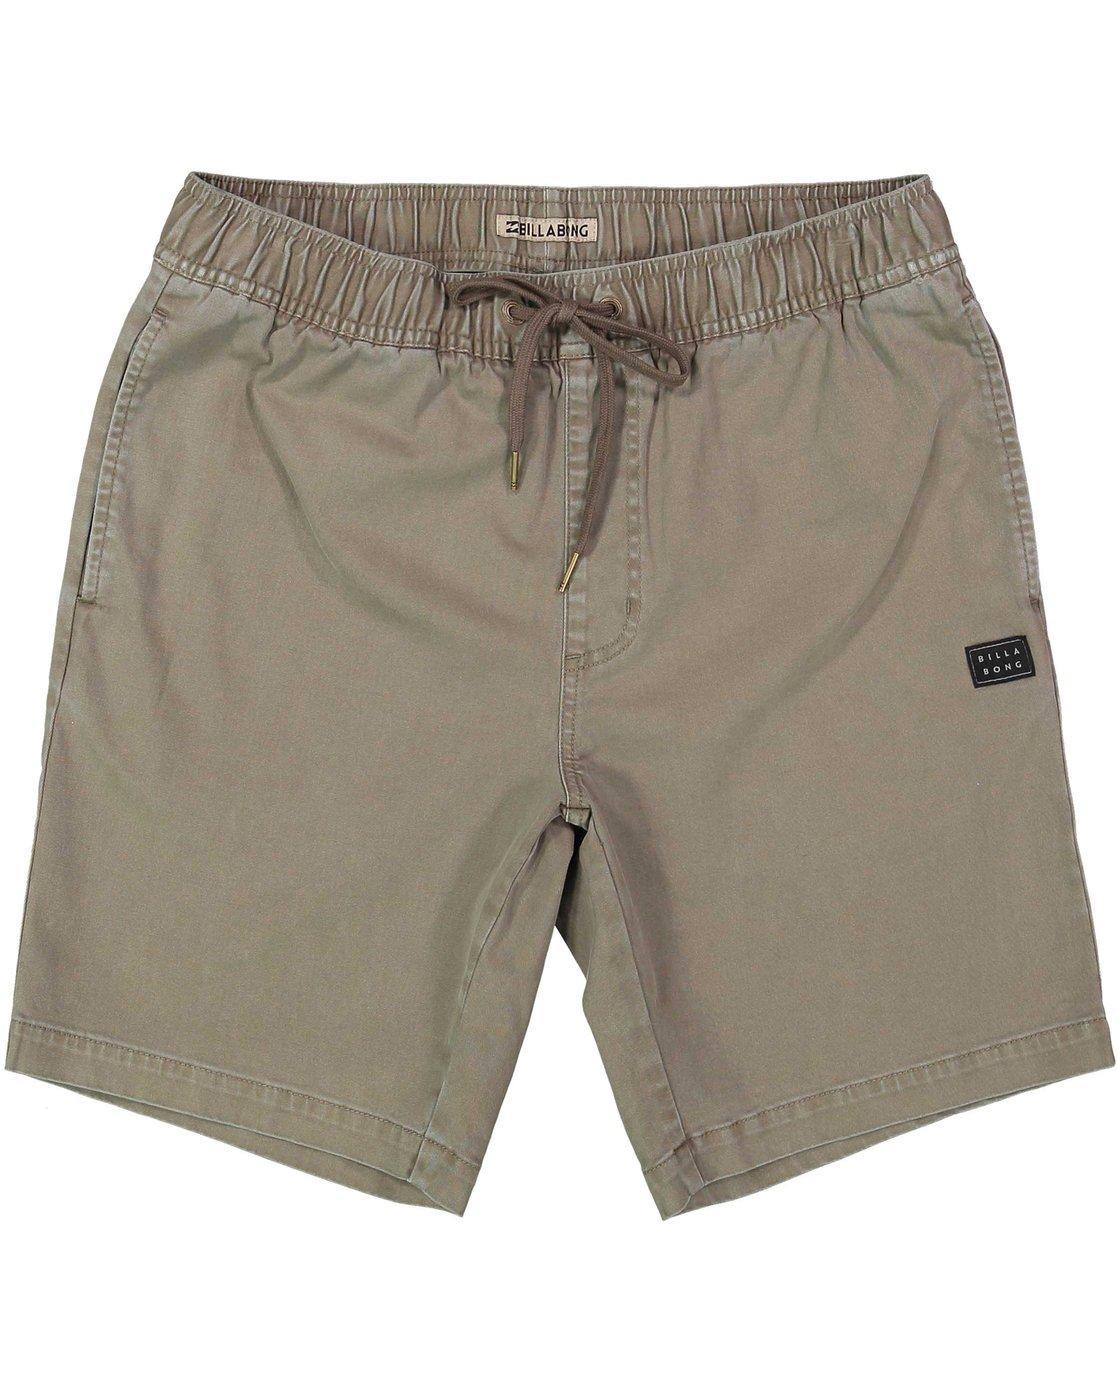 0 Boys Larry Stretch Elastic Shorts Beige B244qbls Billabong